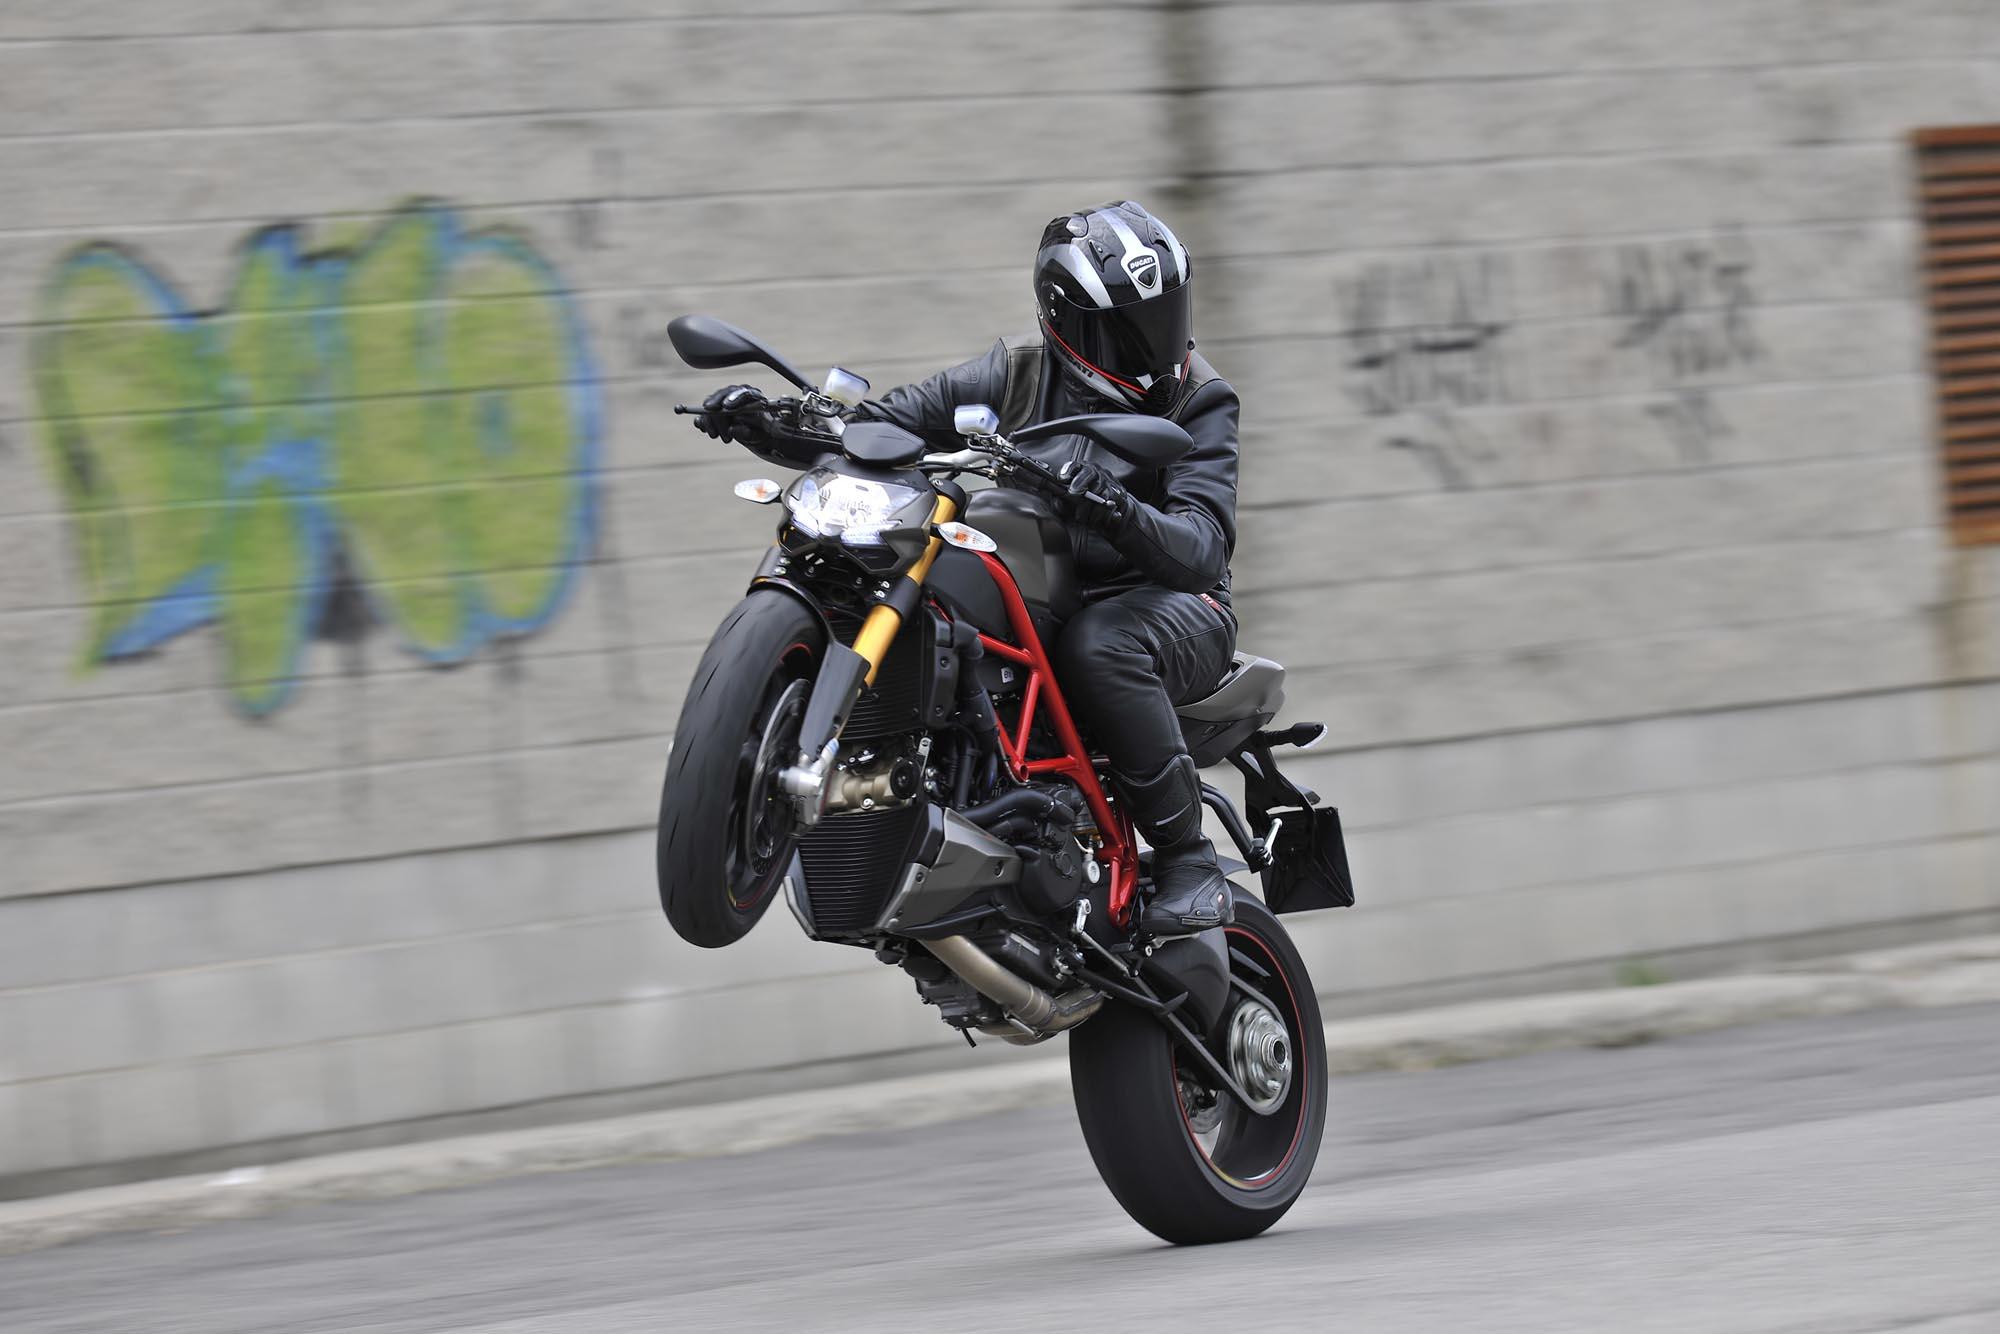 2012 Ducati Streetfighter 848 05